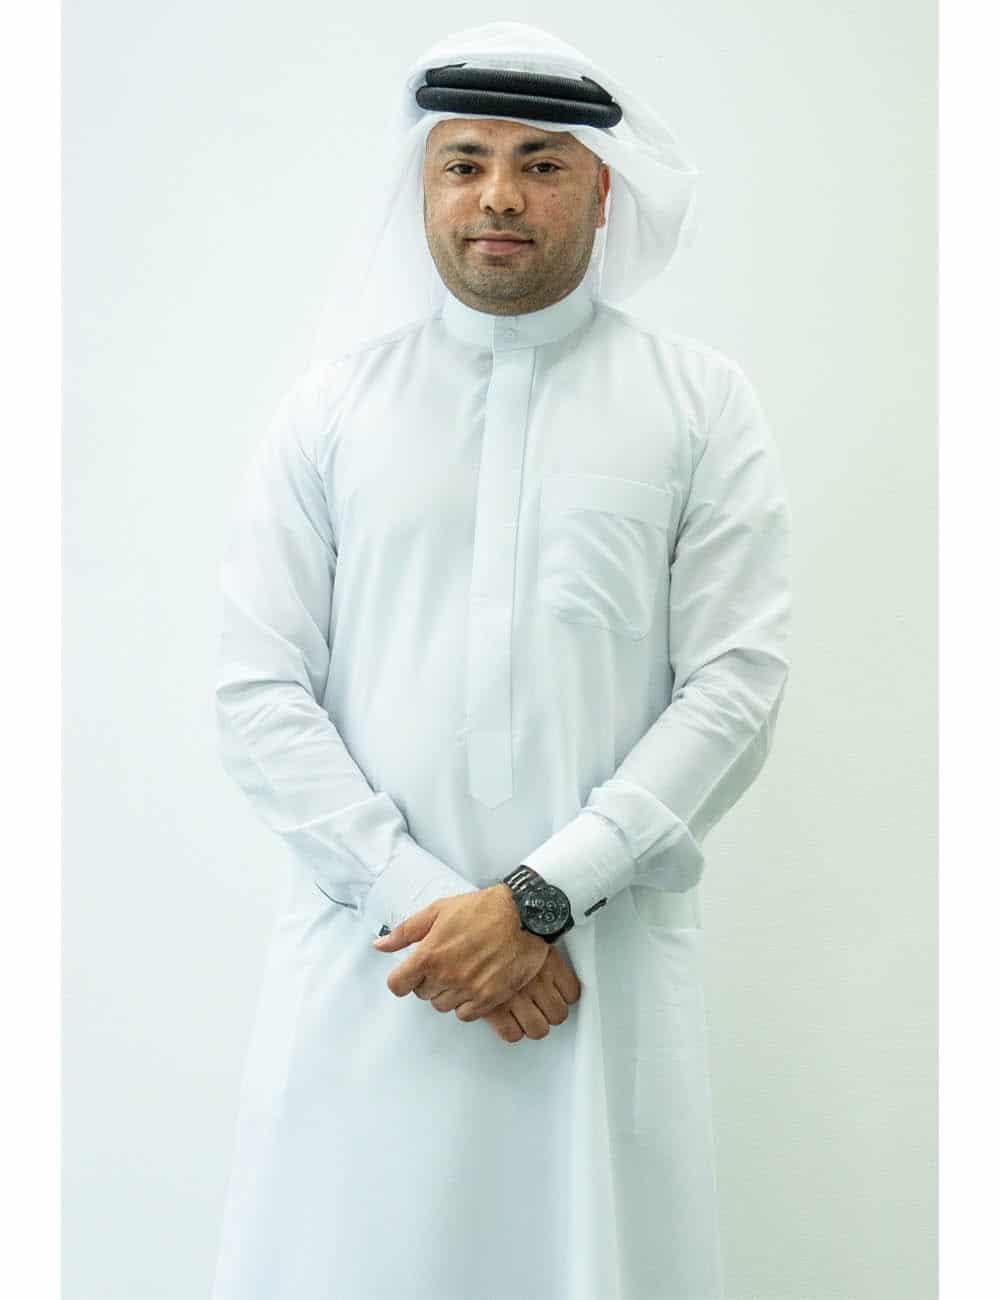 Ahmed website photo